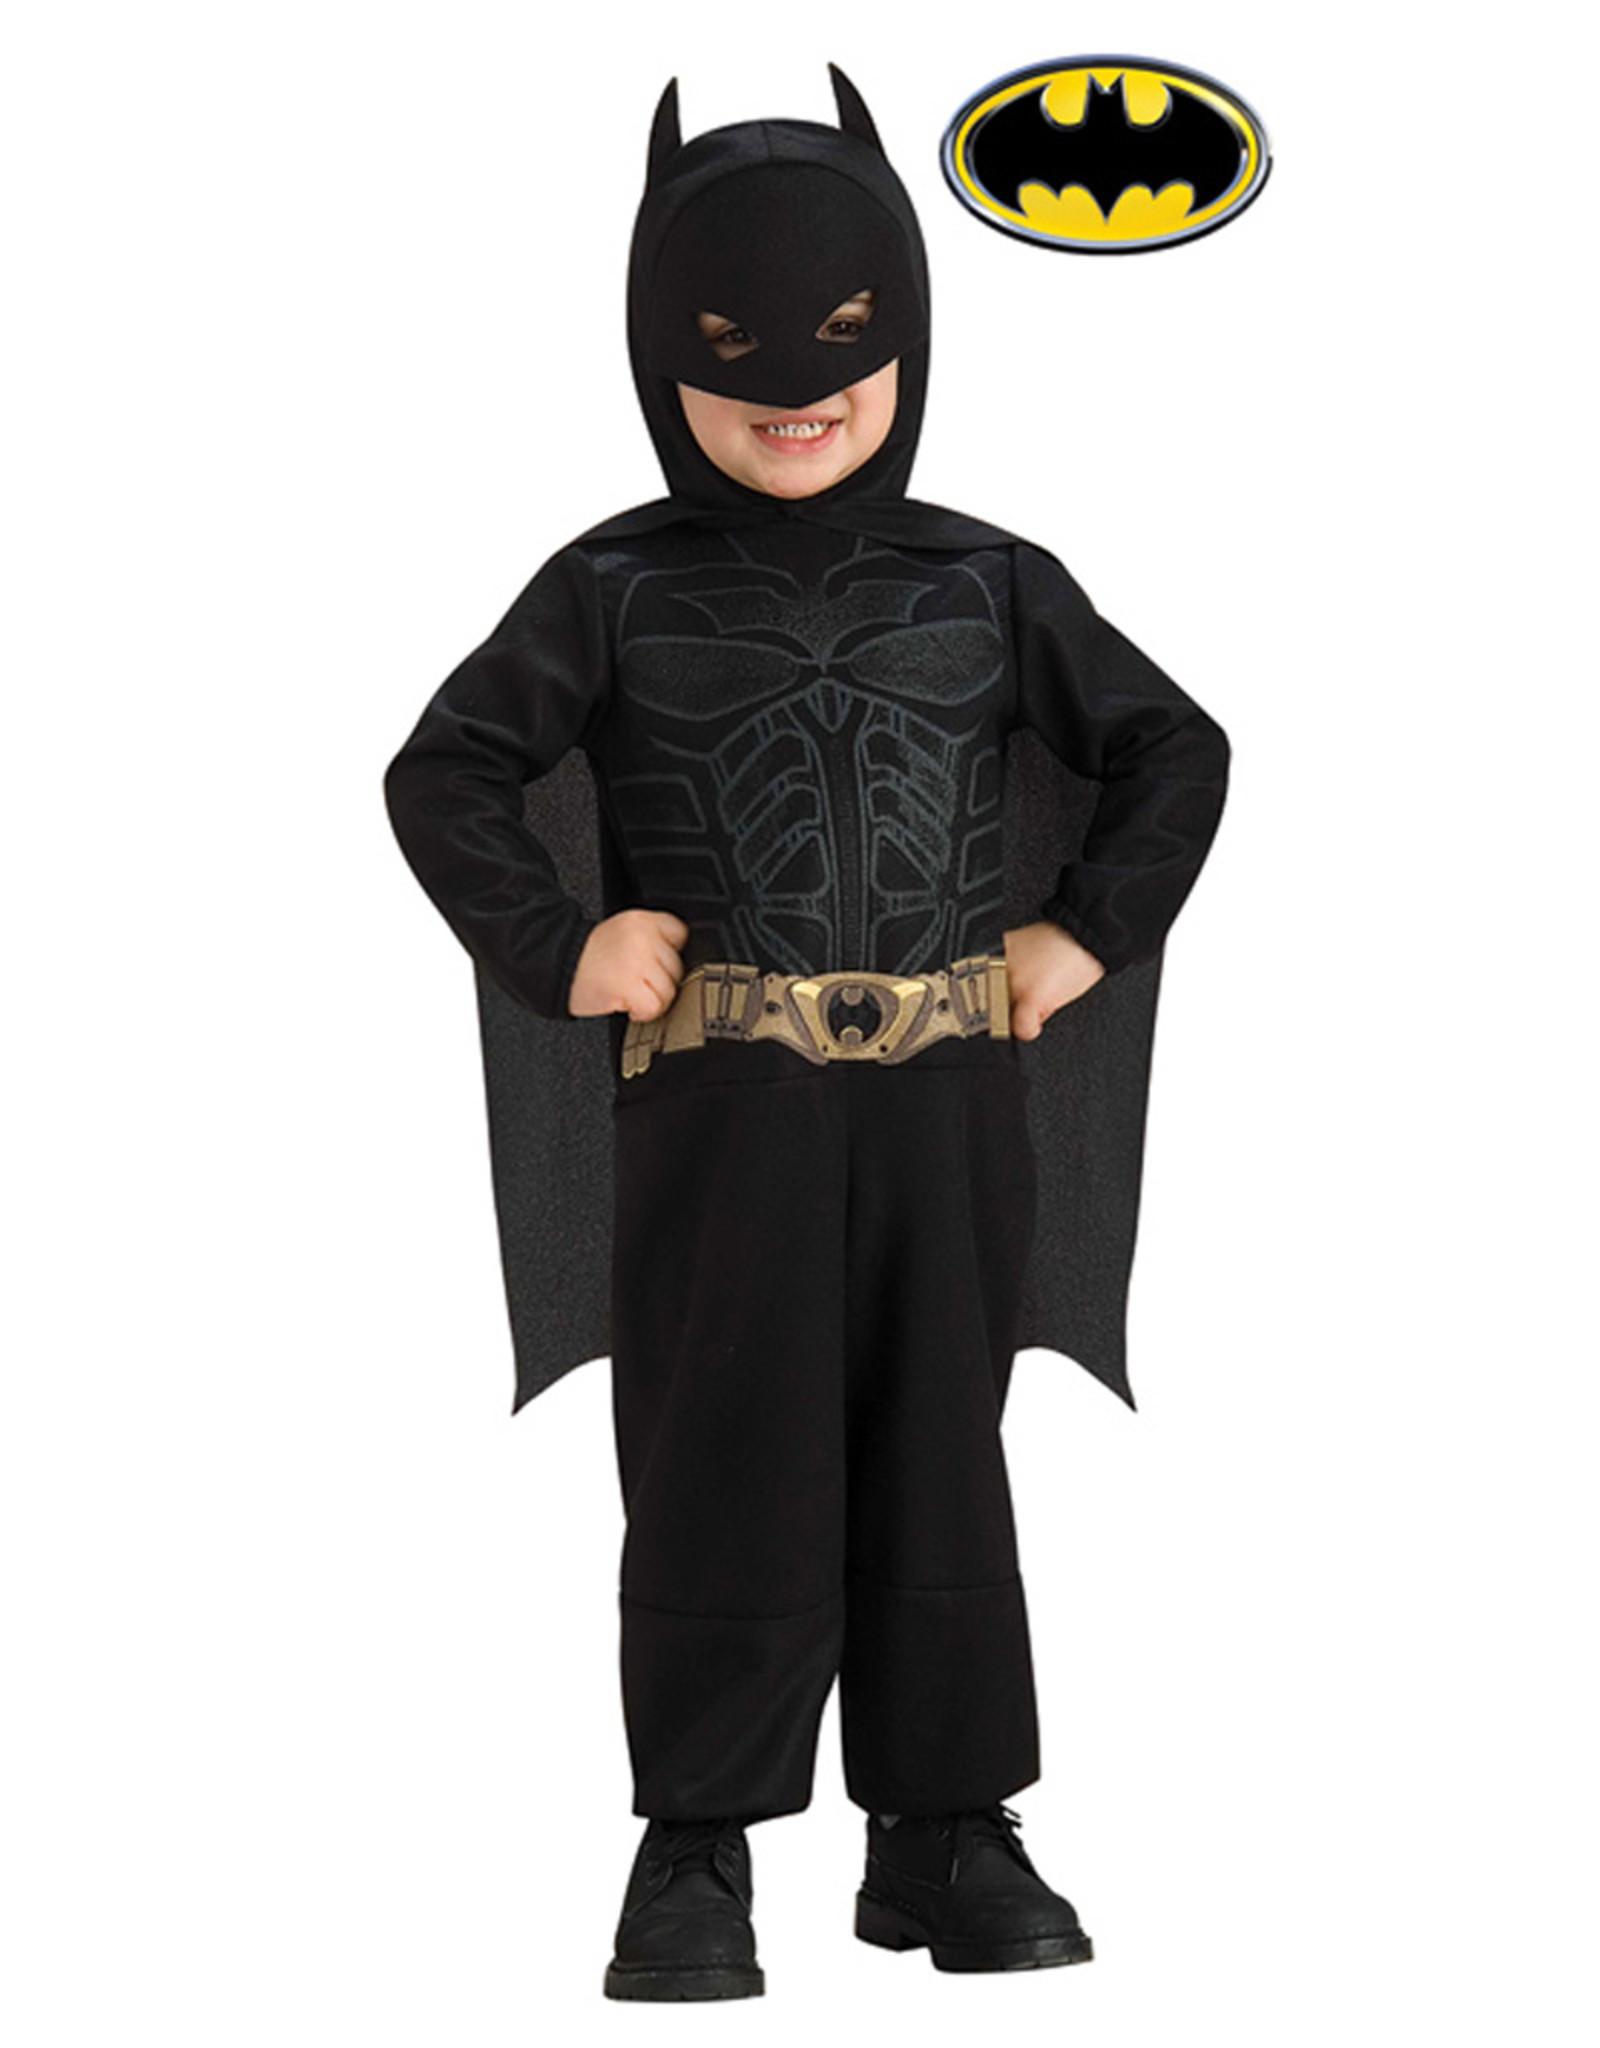 Batman the Dark Knight Costume - Toddler